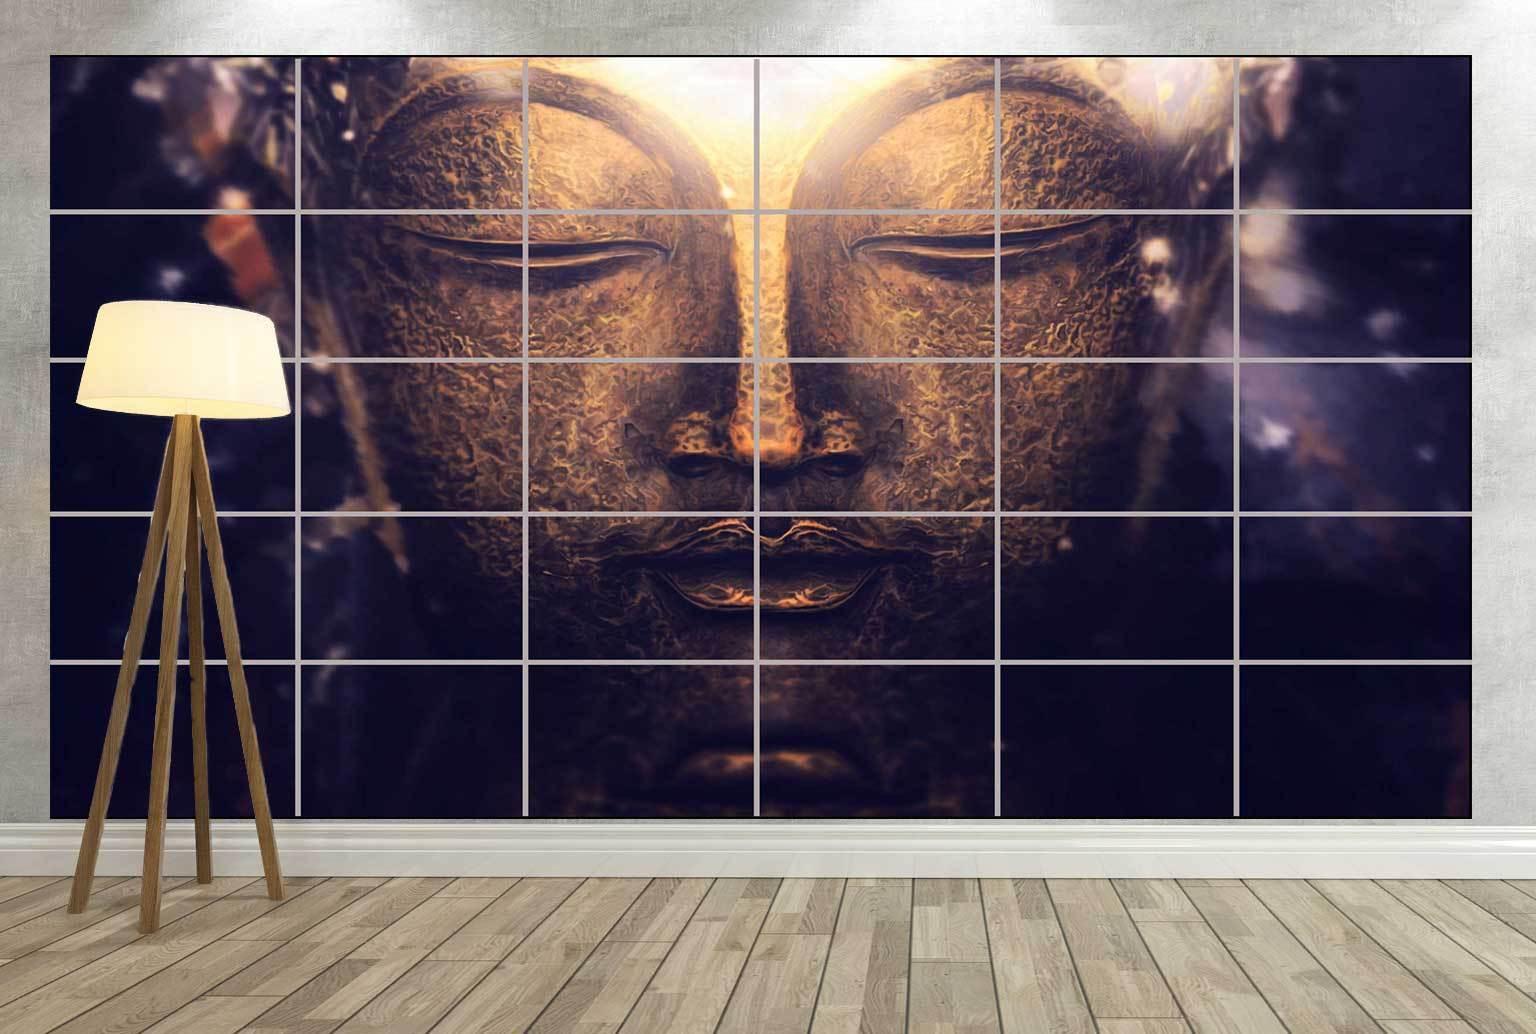 BOUDDHA BUDDHA PEACE Giant Poster Home Deco Salon 252cmX150